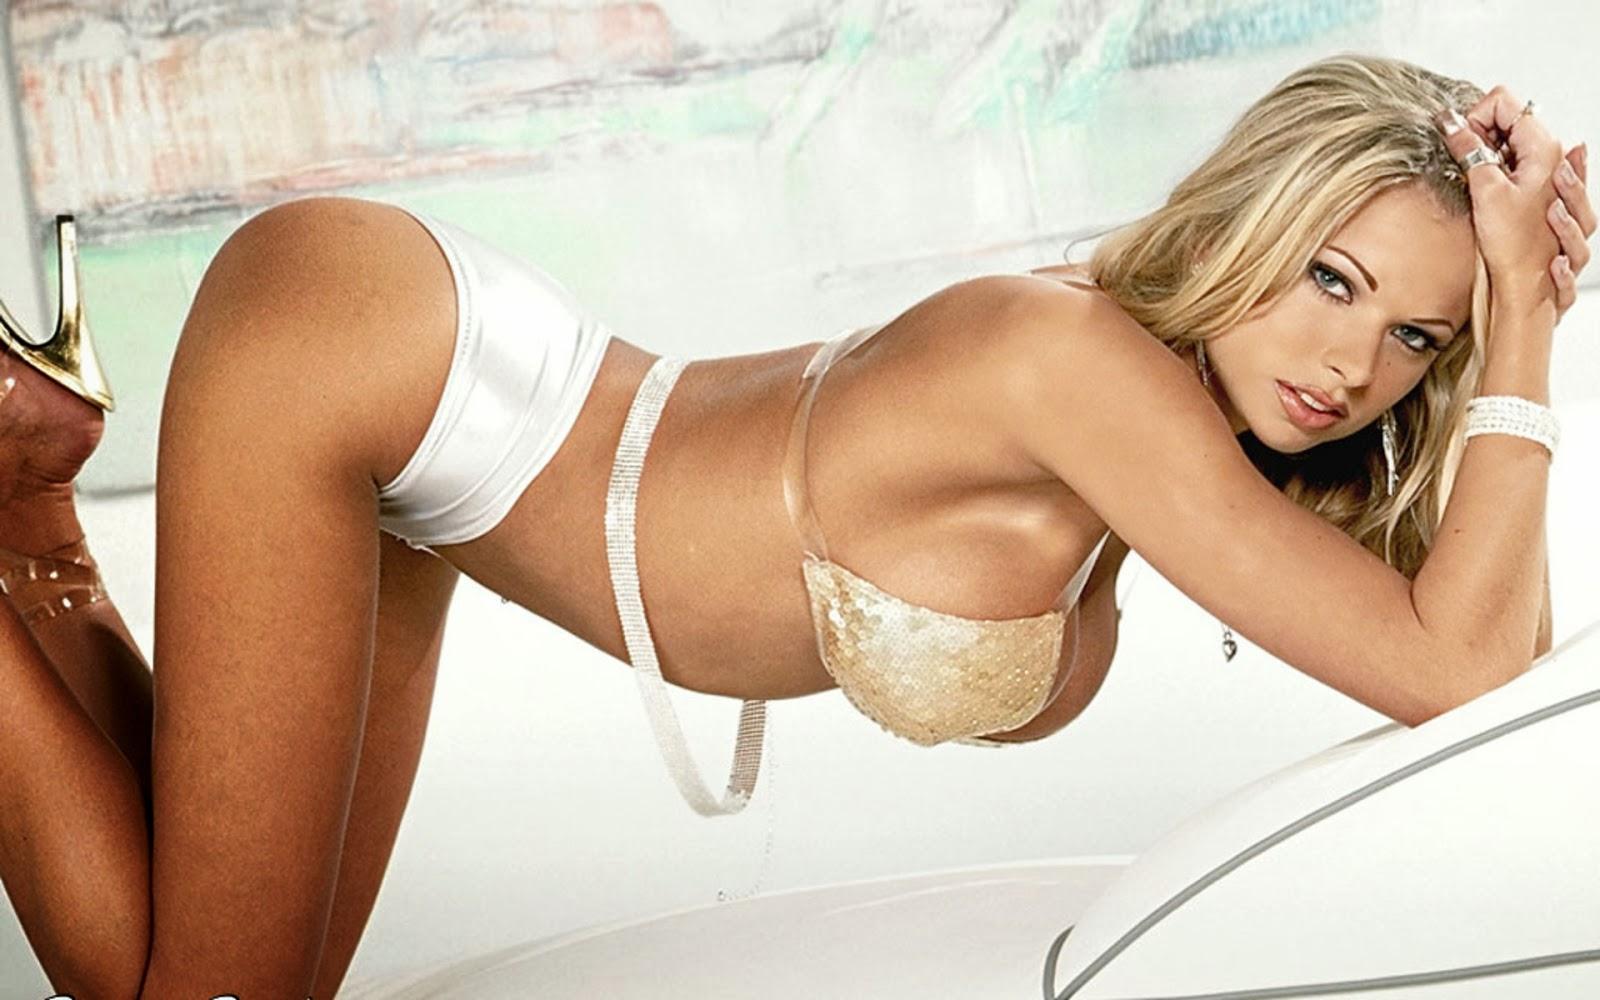 Actriz Porno Estadounidense Se Retira pornstars: 2013